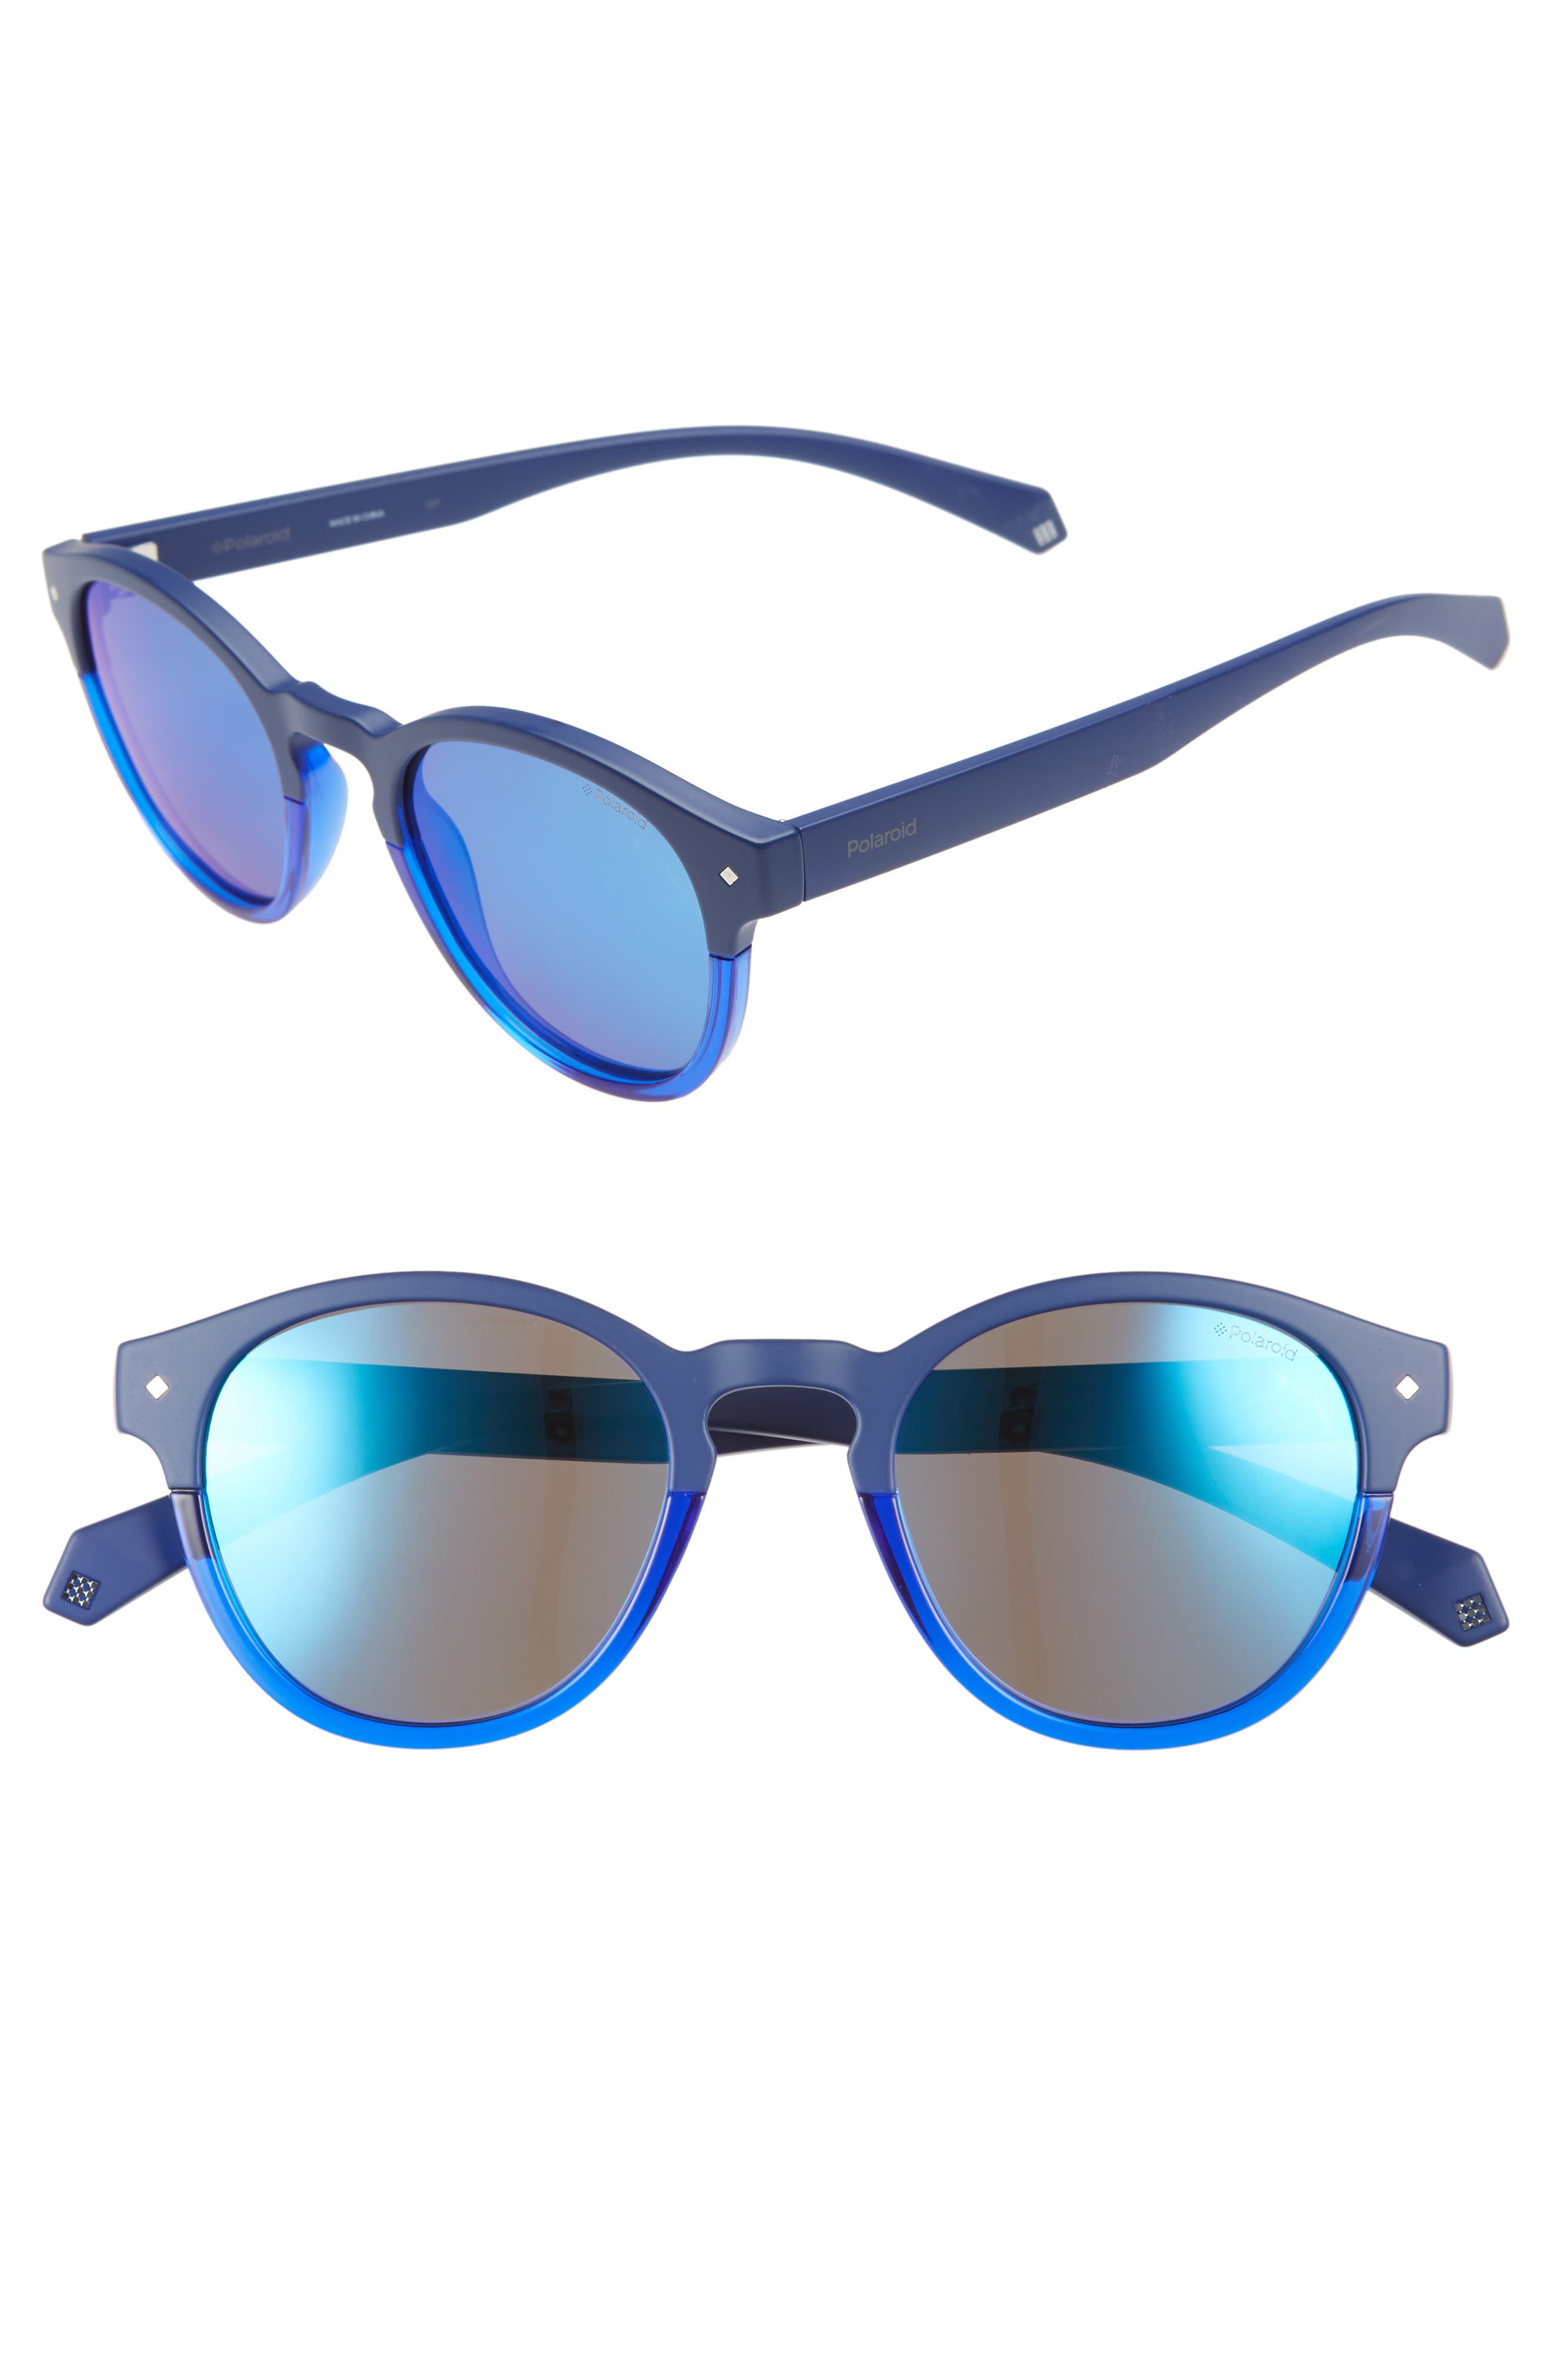 Polaroid 4m Polarized Round Sunglasses - Blue